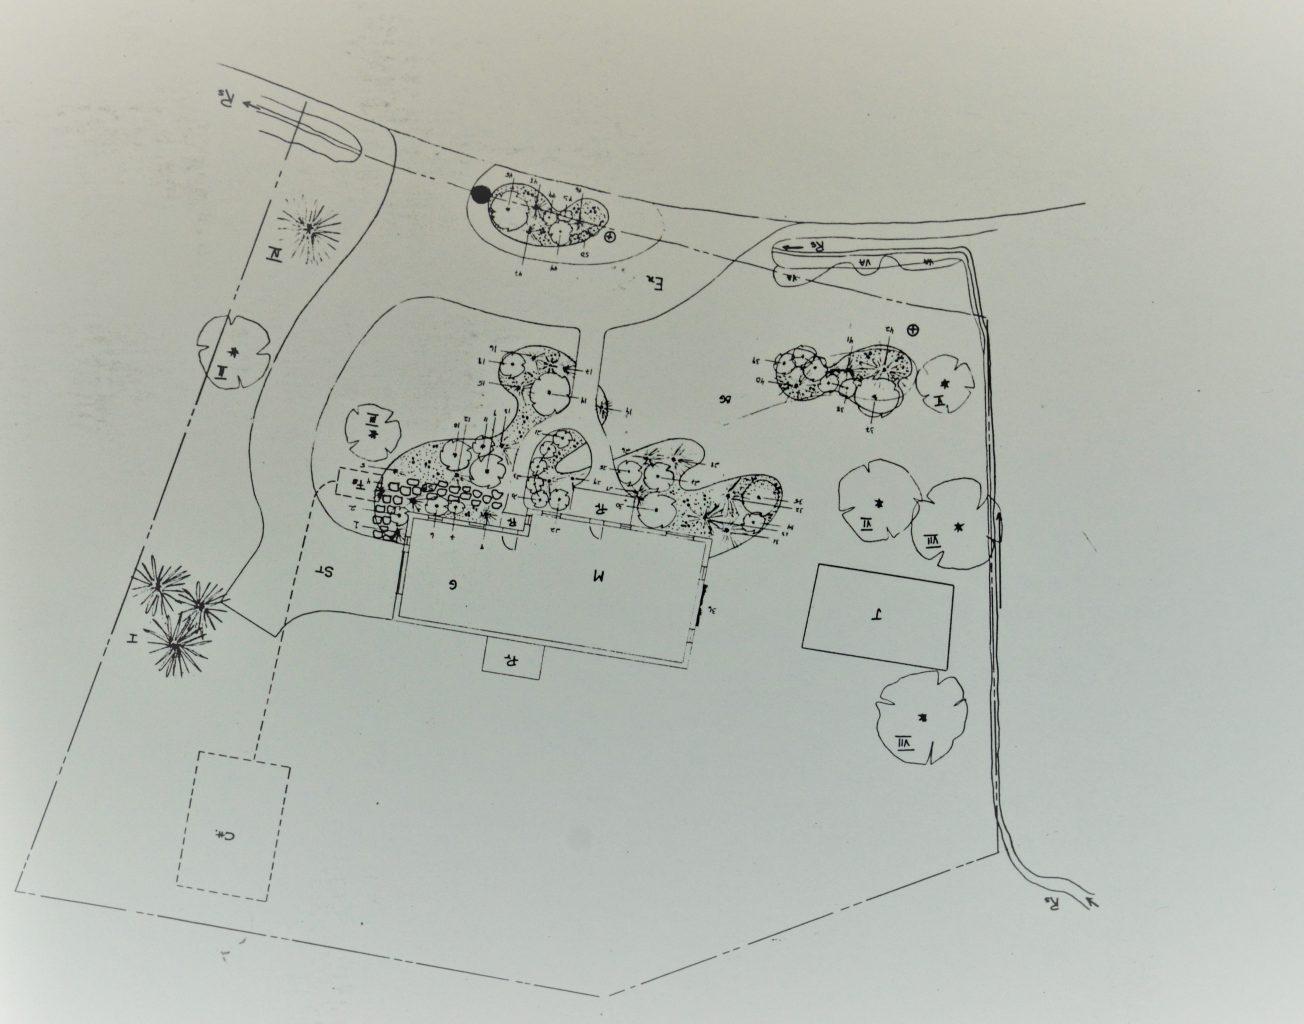 Plani-Décor-Aménagement paysager-Plan 6